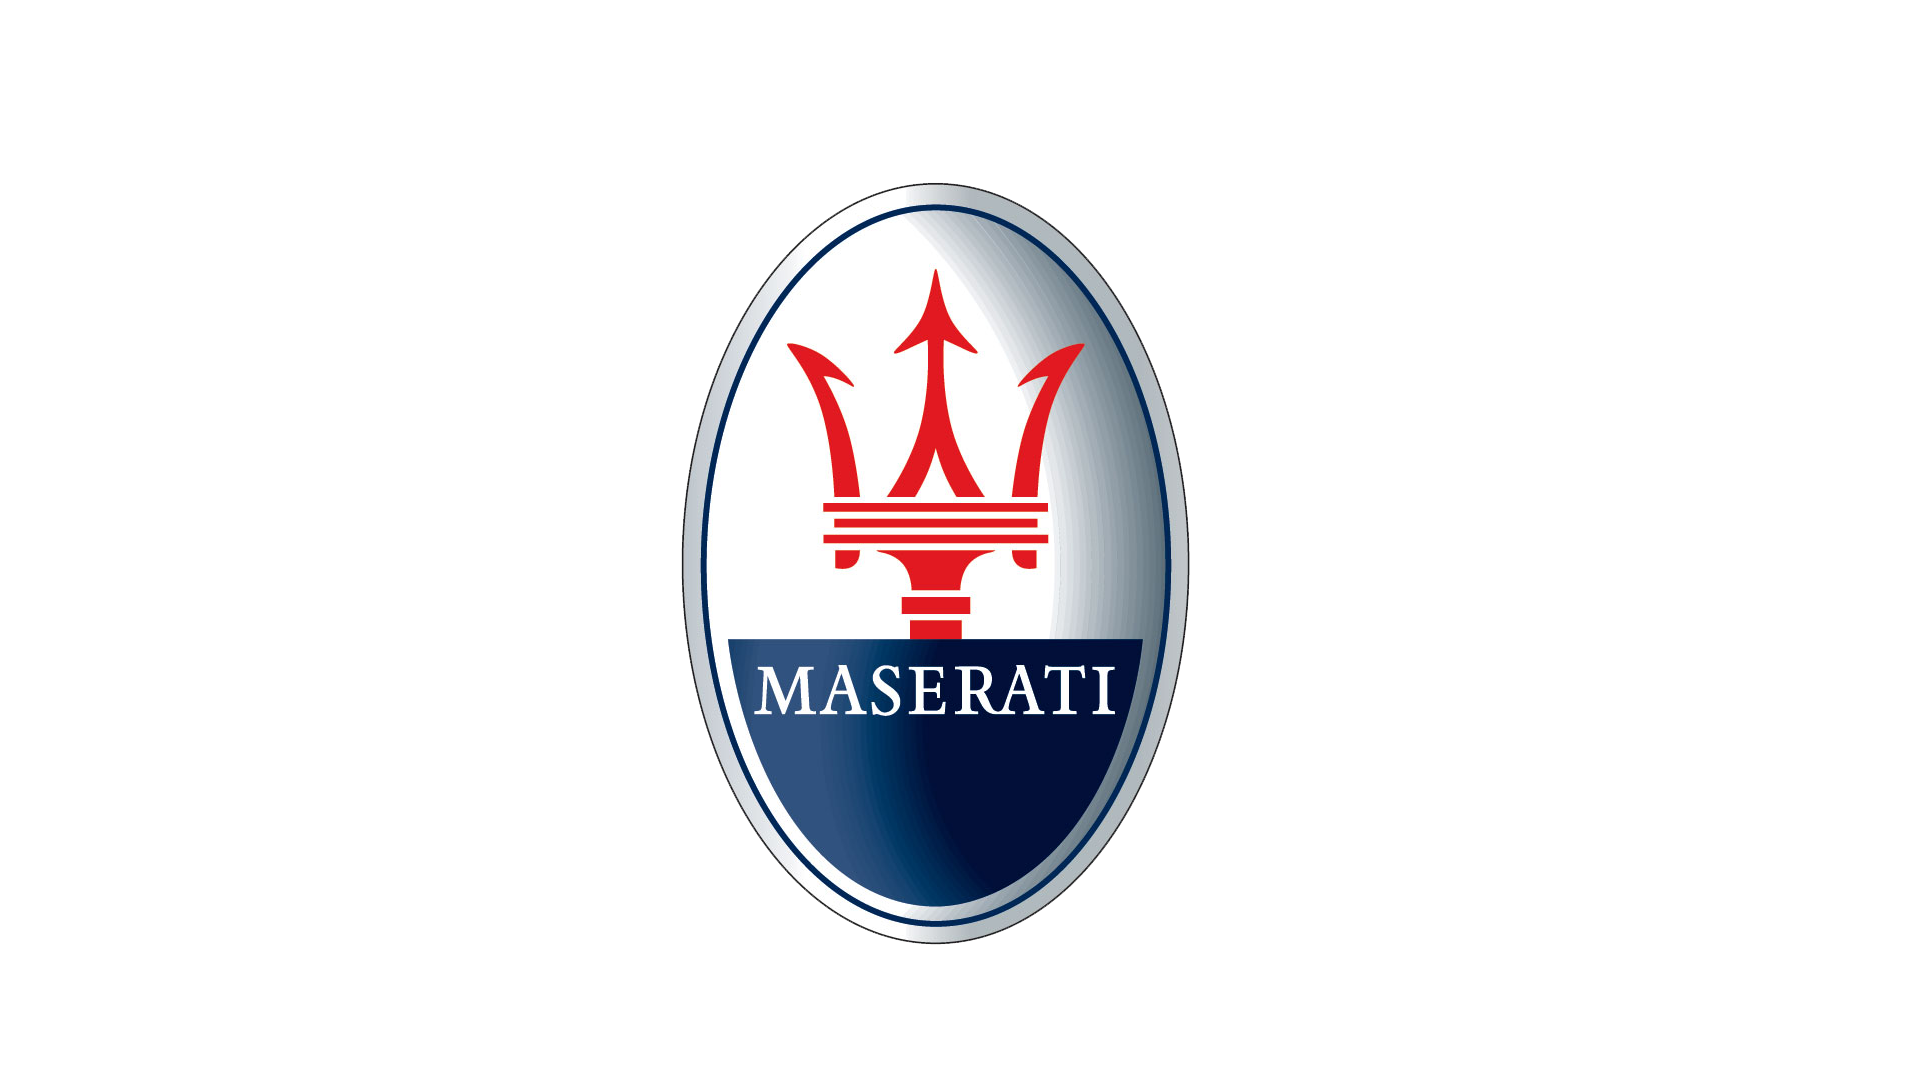 Maserati Logo Hd 1080p Png Meaning Carlogos Org